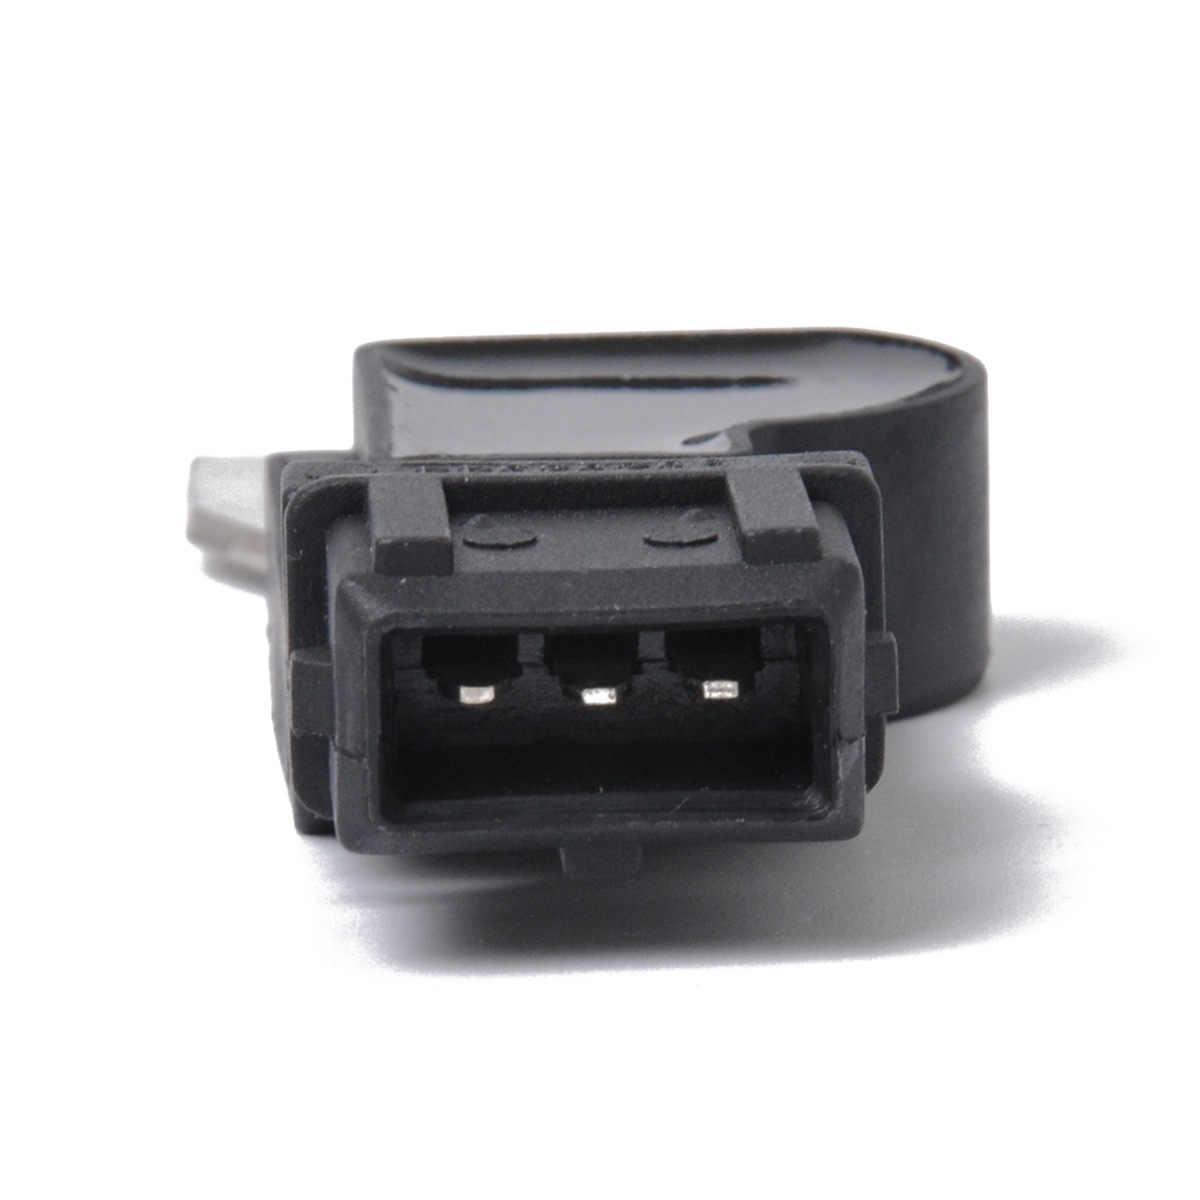 Sensor de árbol de levas del Sensor del automóvil de DAEWOO Chevrolet de la Boutique de la frontera cruzada 96253544